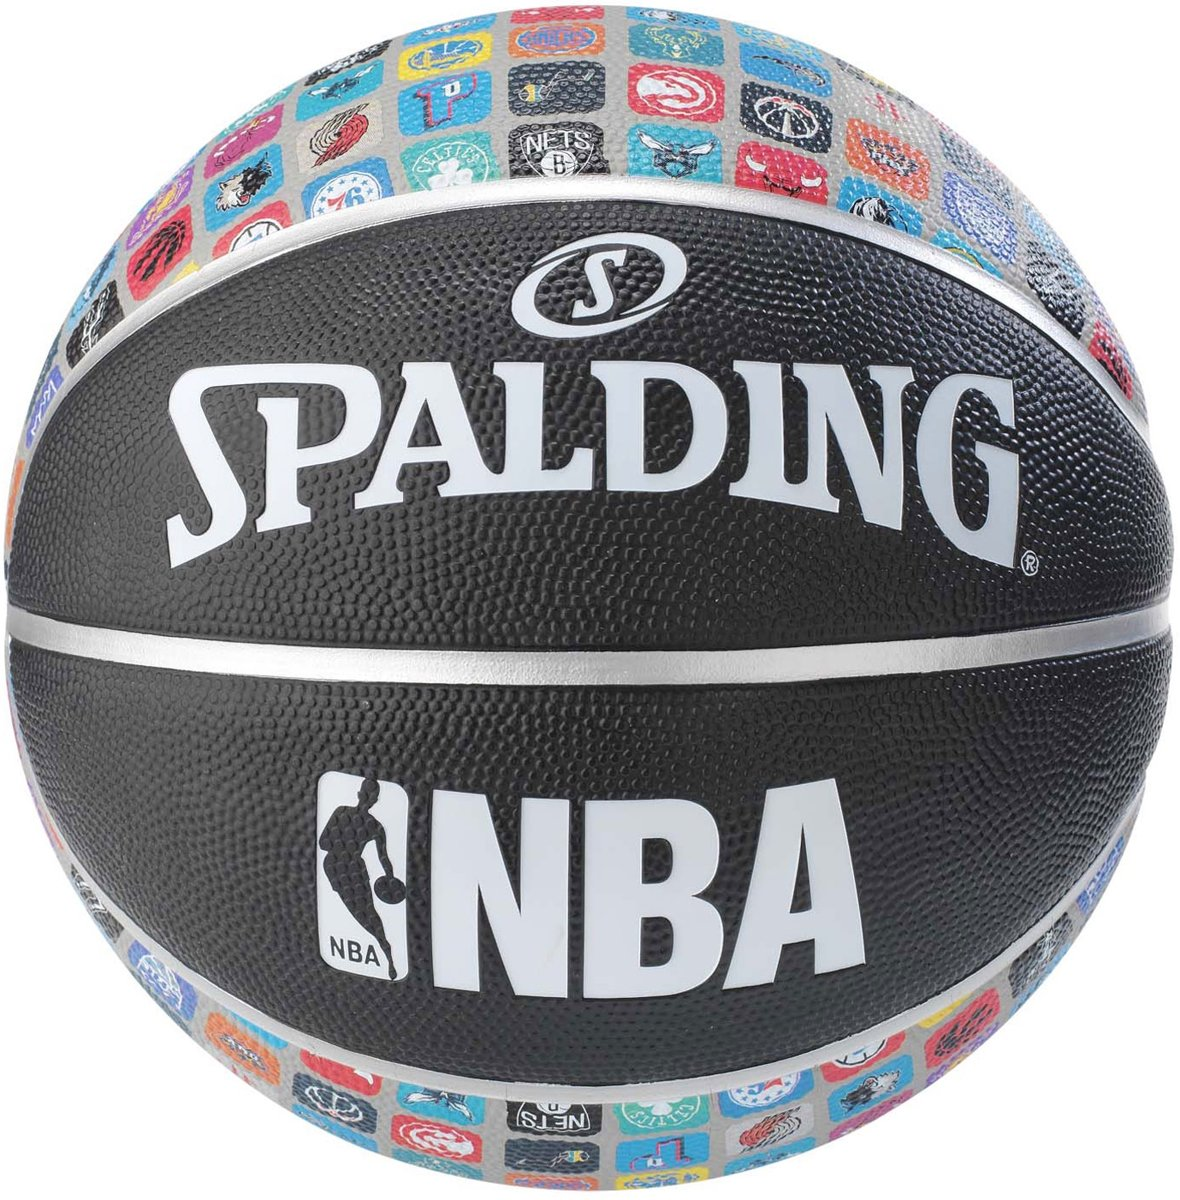 Spalding basketbal NBA Icons - Maat 7